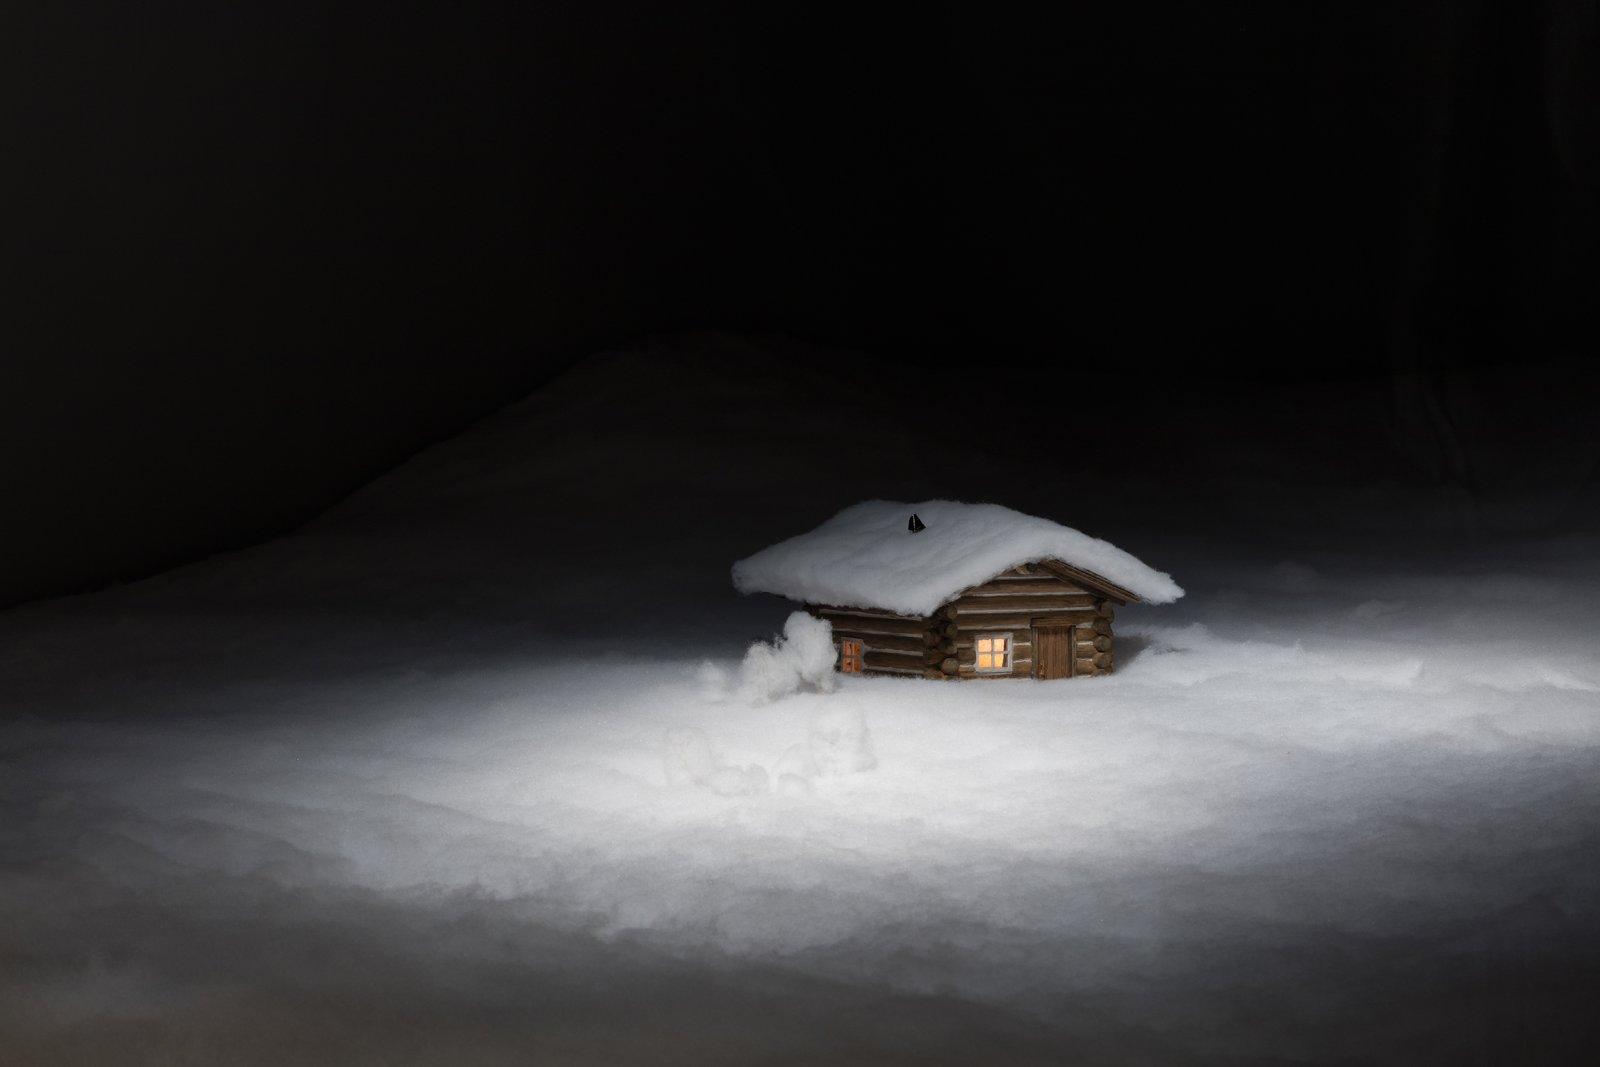 Liz Magor, Cabin in the Snow (detail), 1989, fabric, model log cabin, dimensions variable. Installation view, Habitude, Musée d'art contemporain de Montréal, 2016 by Liz Magor